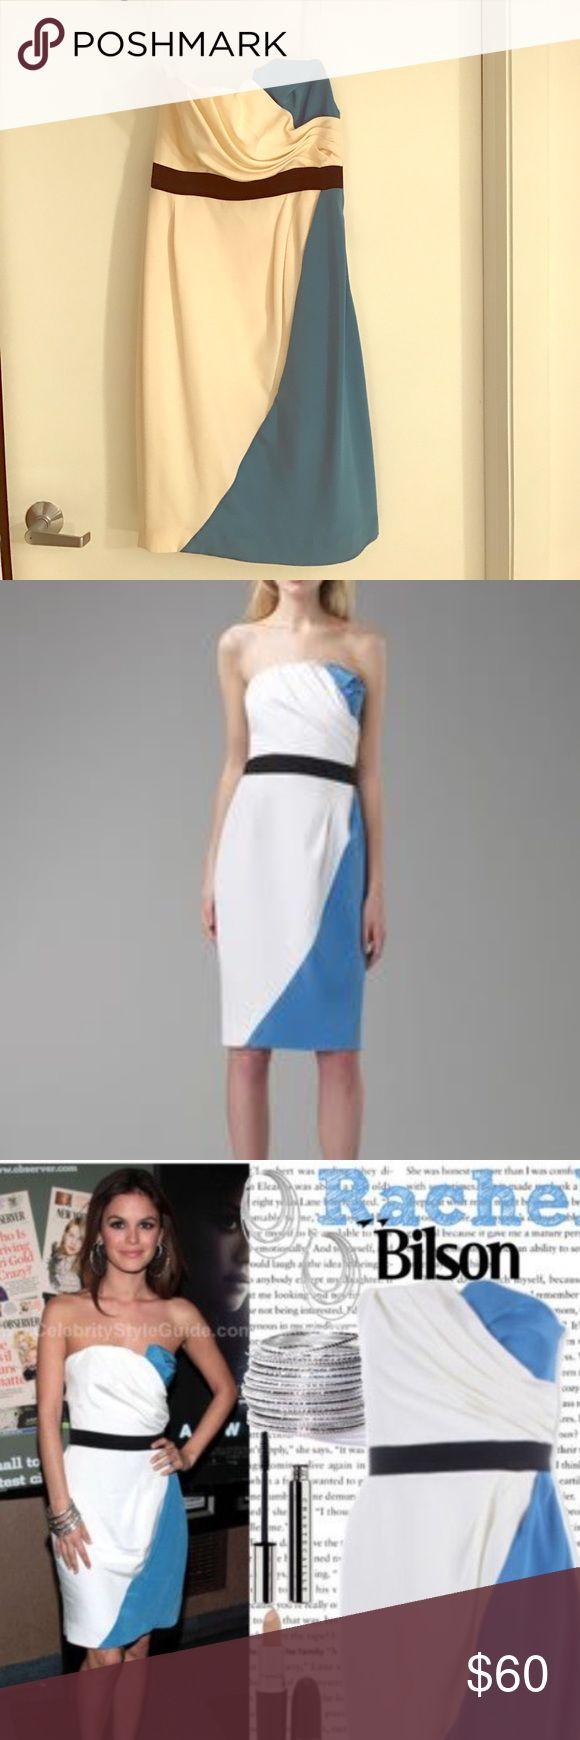 Abaete strapless color block dress! Strapless colorblock dress, as seen on Rachel Wilson! Worn once! Abaete Dresses Strapless